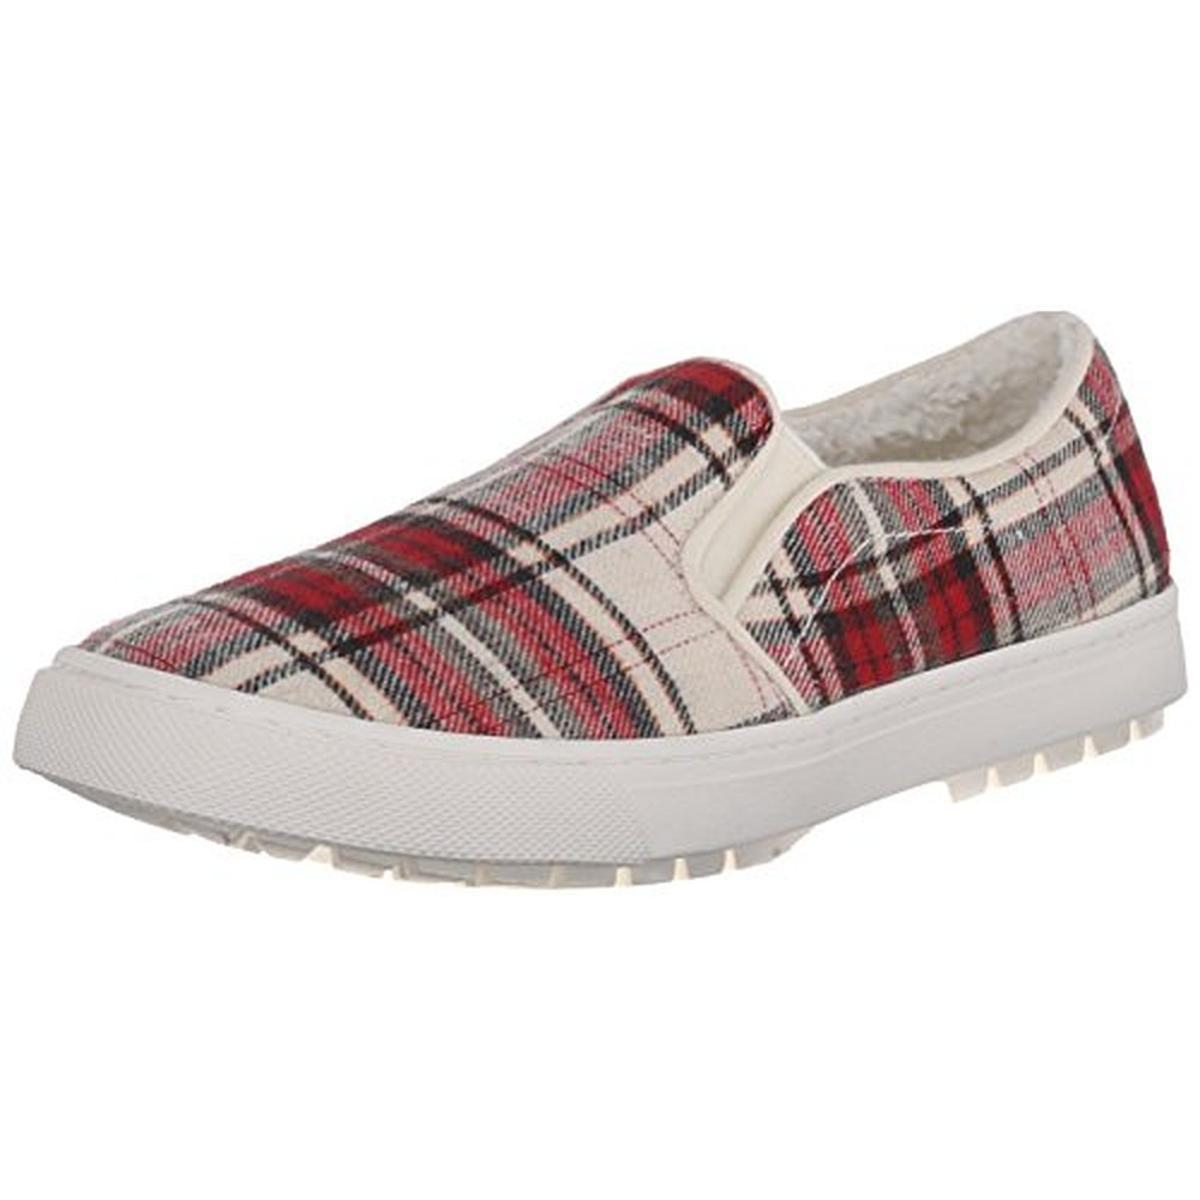 Roxy Juno Slip On Shoes